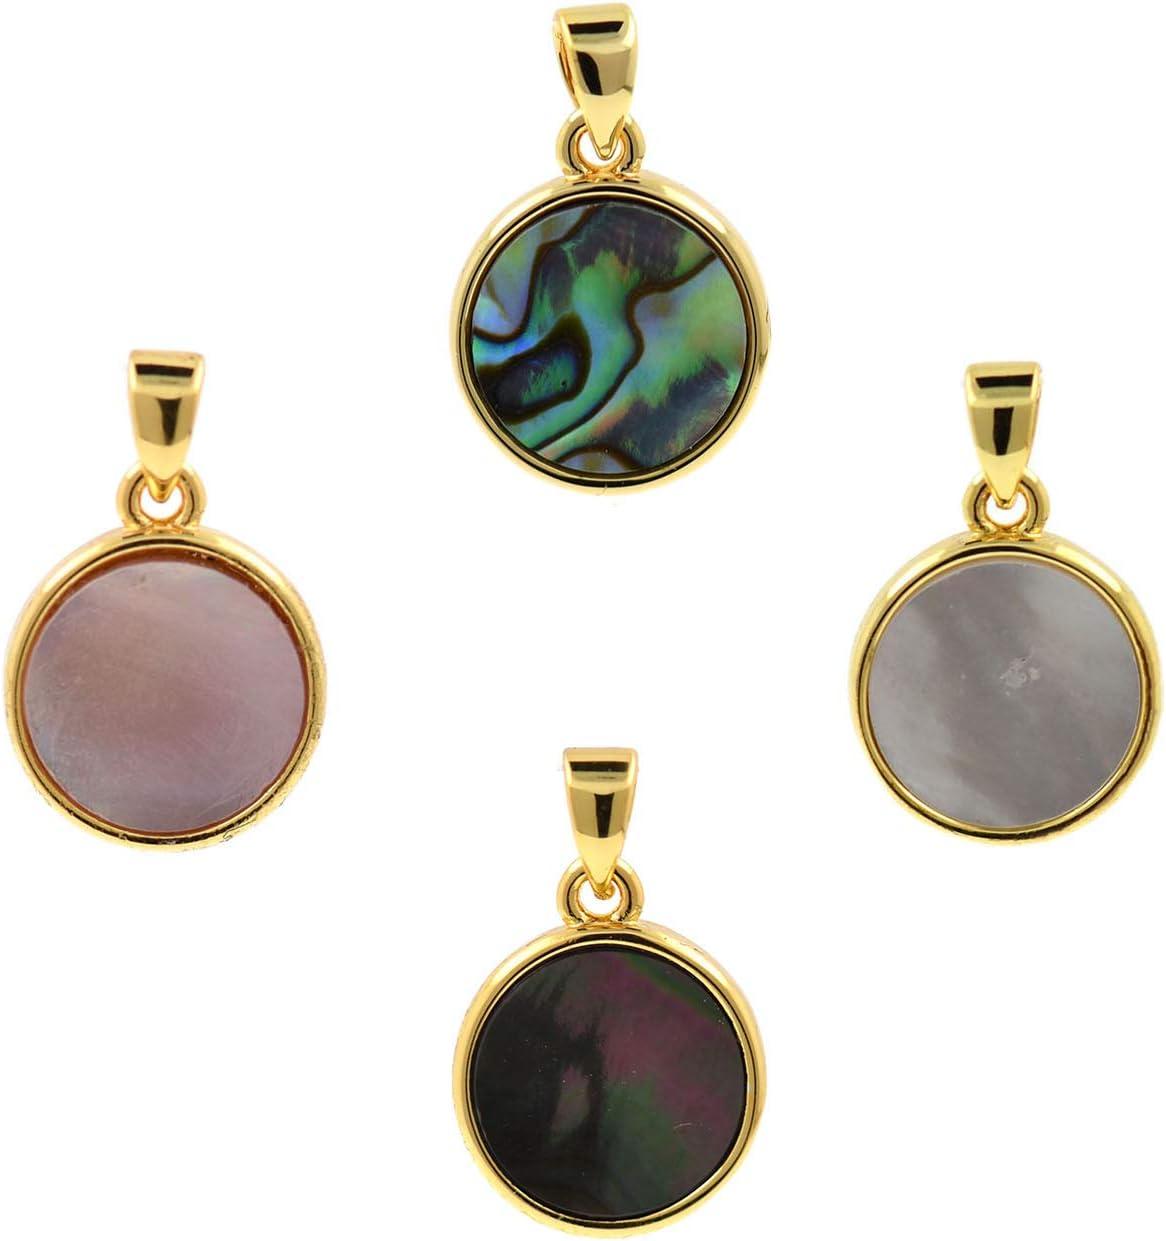 DIY 10pcs//Pack Natural Round Wood Pendants Handicrafts Earring Accessories